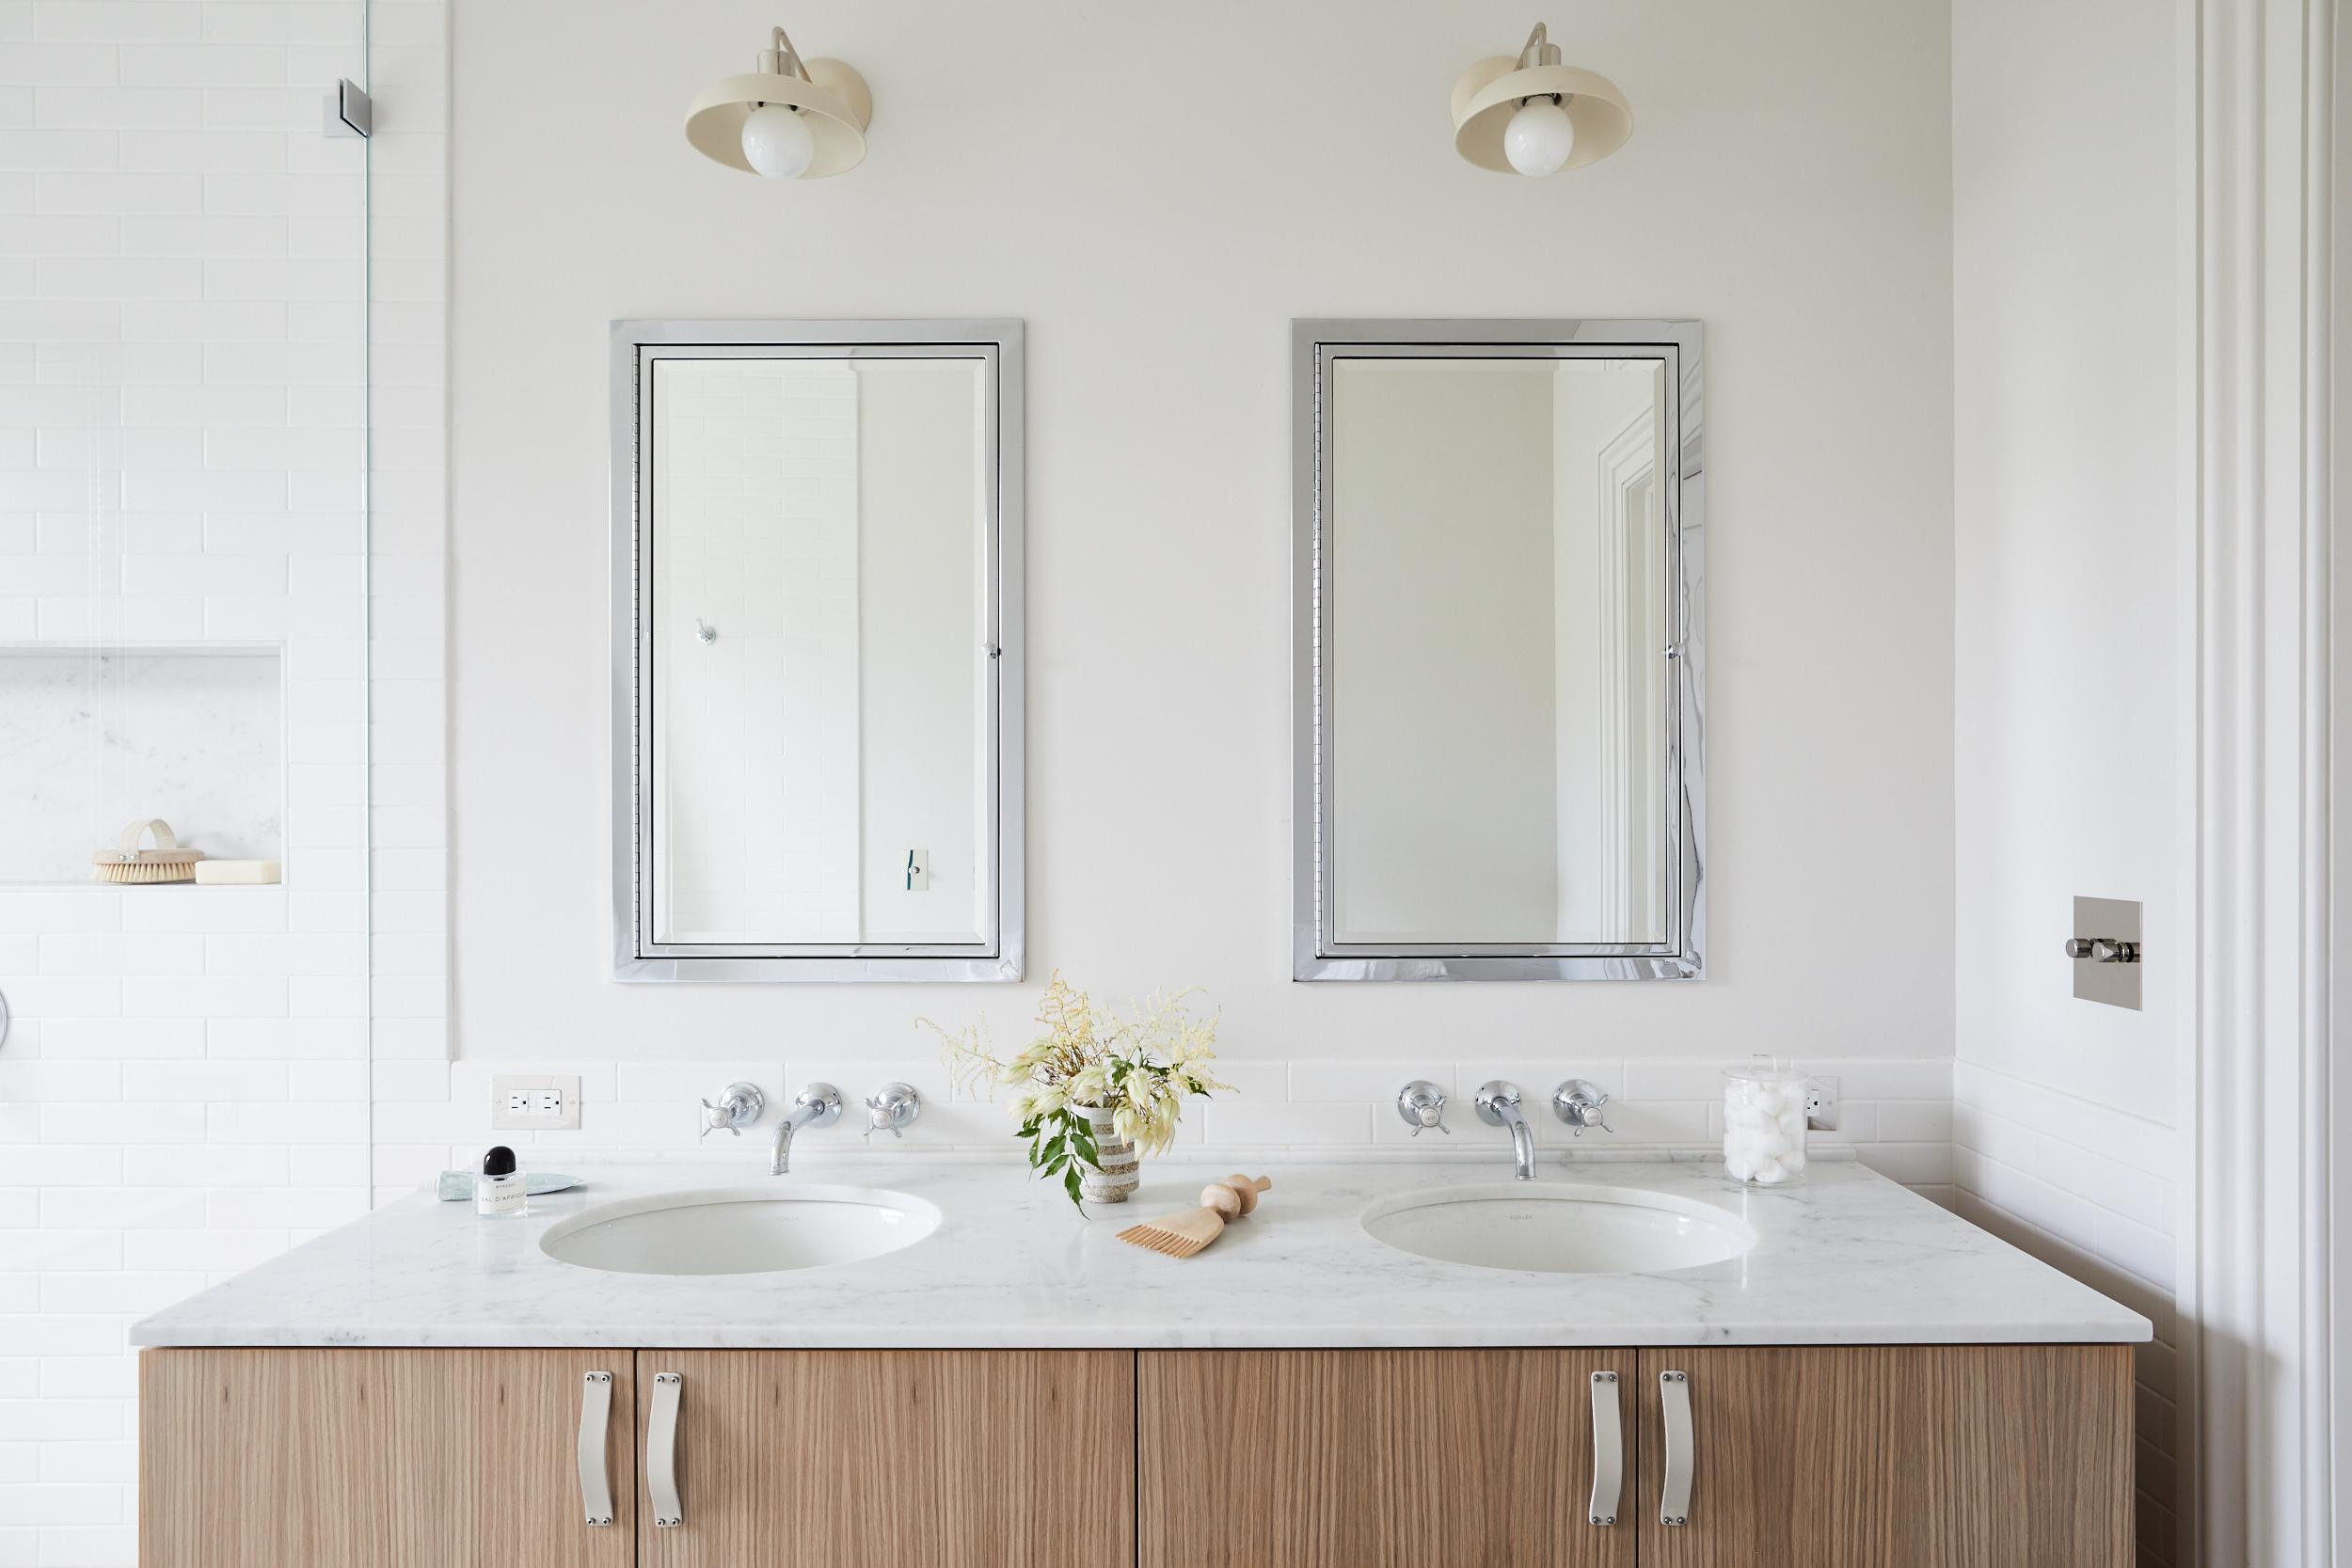 Slope_Townhouse_Bathroom_Master_012.jpg